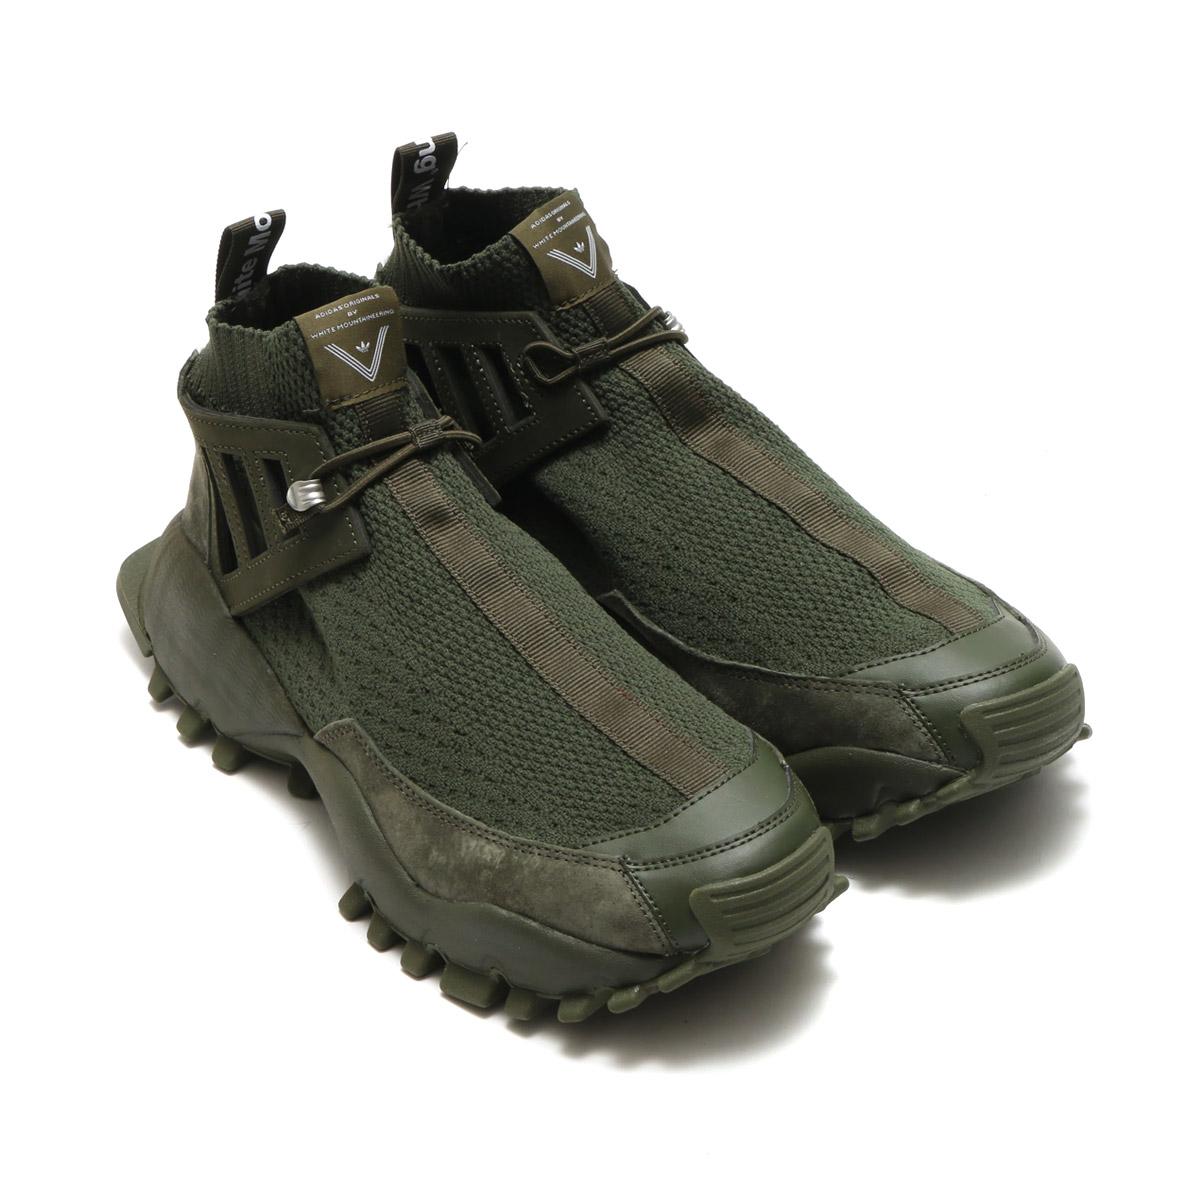 adidas Originals WM SEEULATER ALLEDO PK(アディダス オリジナルス WM シーユーレイター アレド PK)Night Cargo F15/Night Cargo F15/Night Cargo F15【メンズ スニーカー】17FW-I